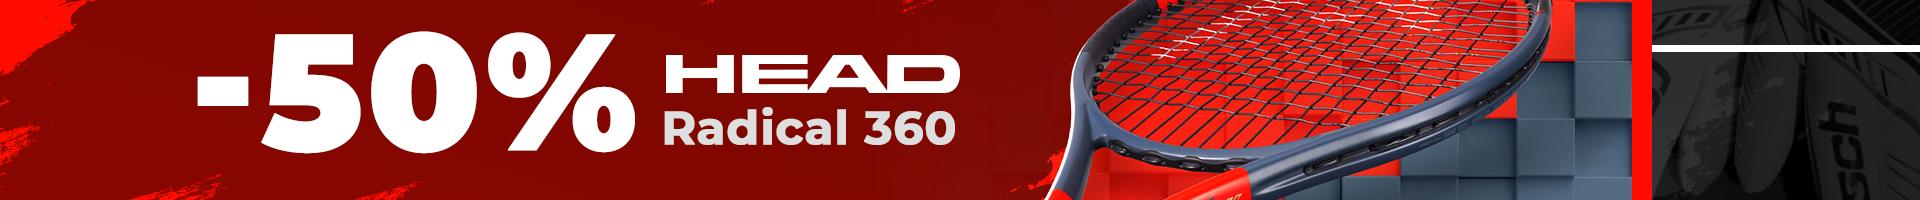 radical50%